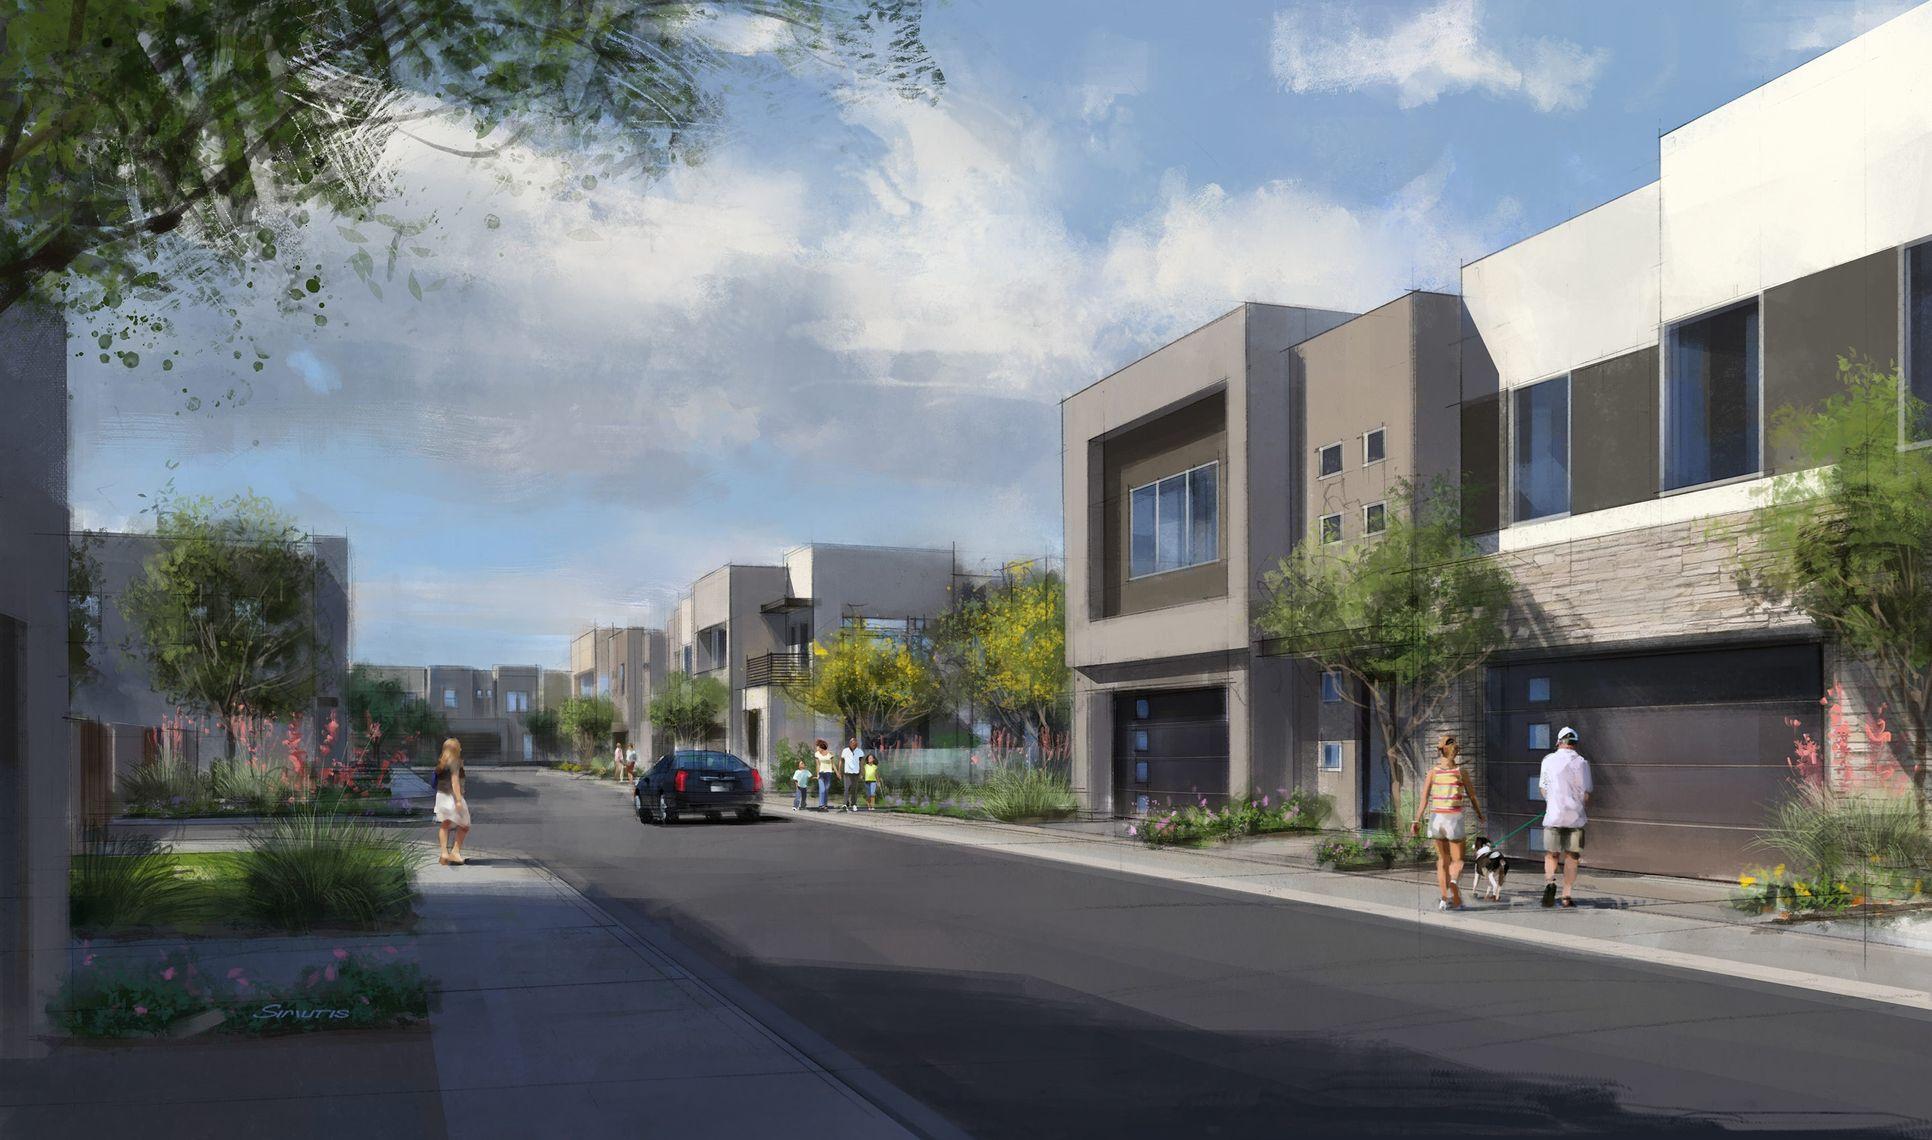 skye-street-scene-new-homes-scottsdale-az